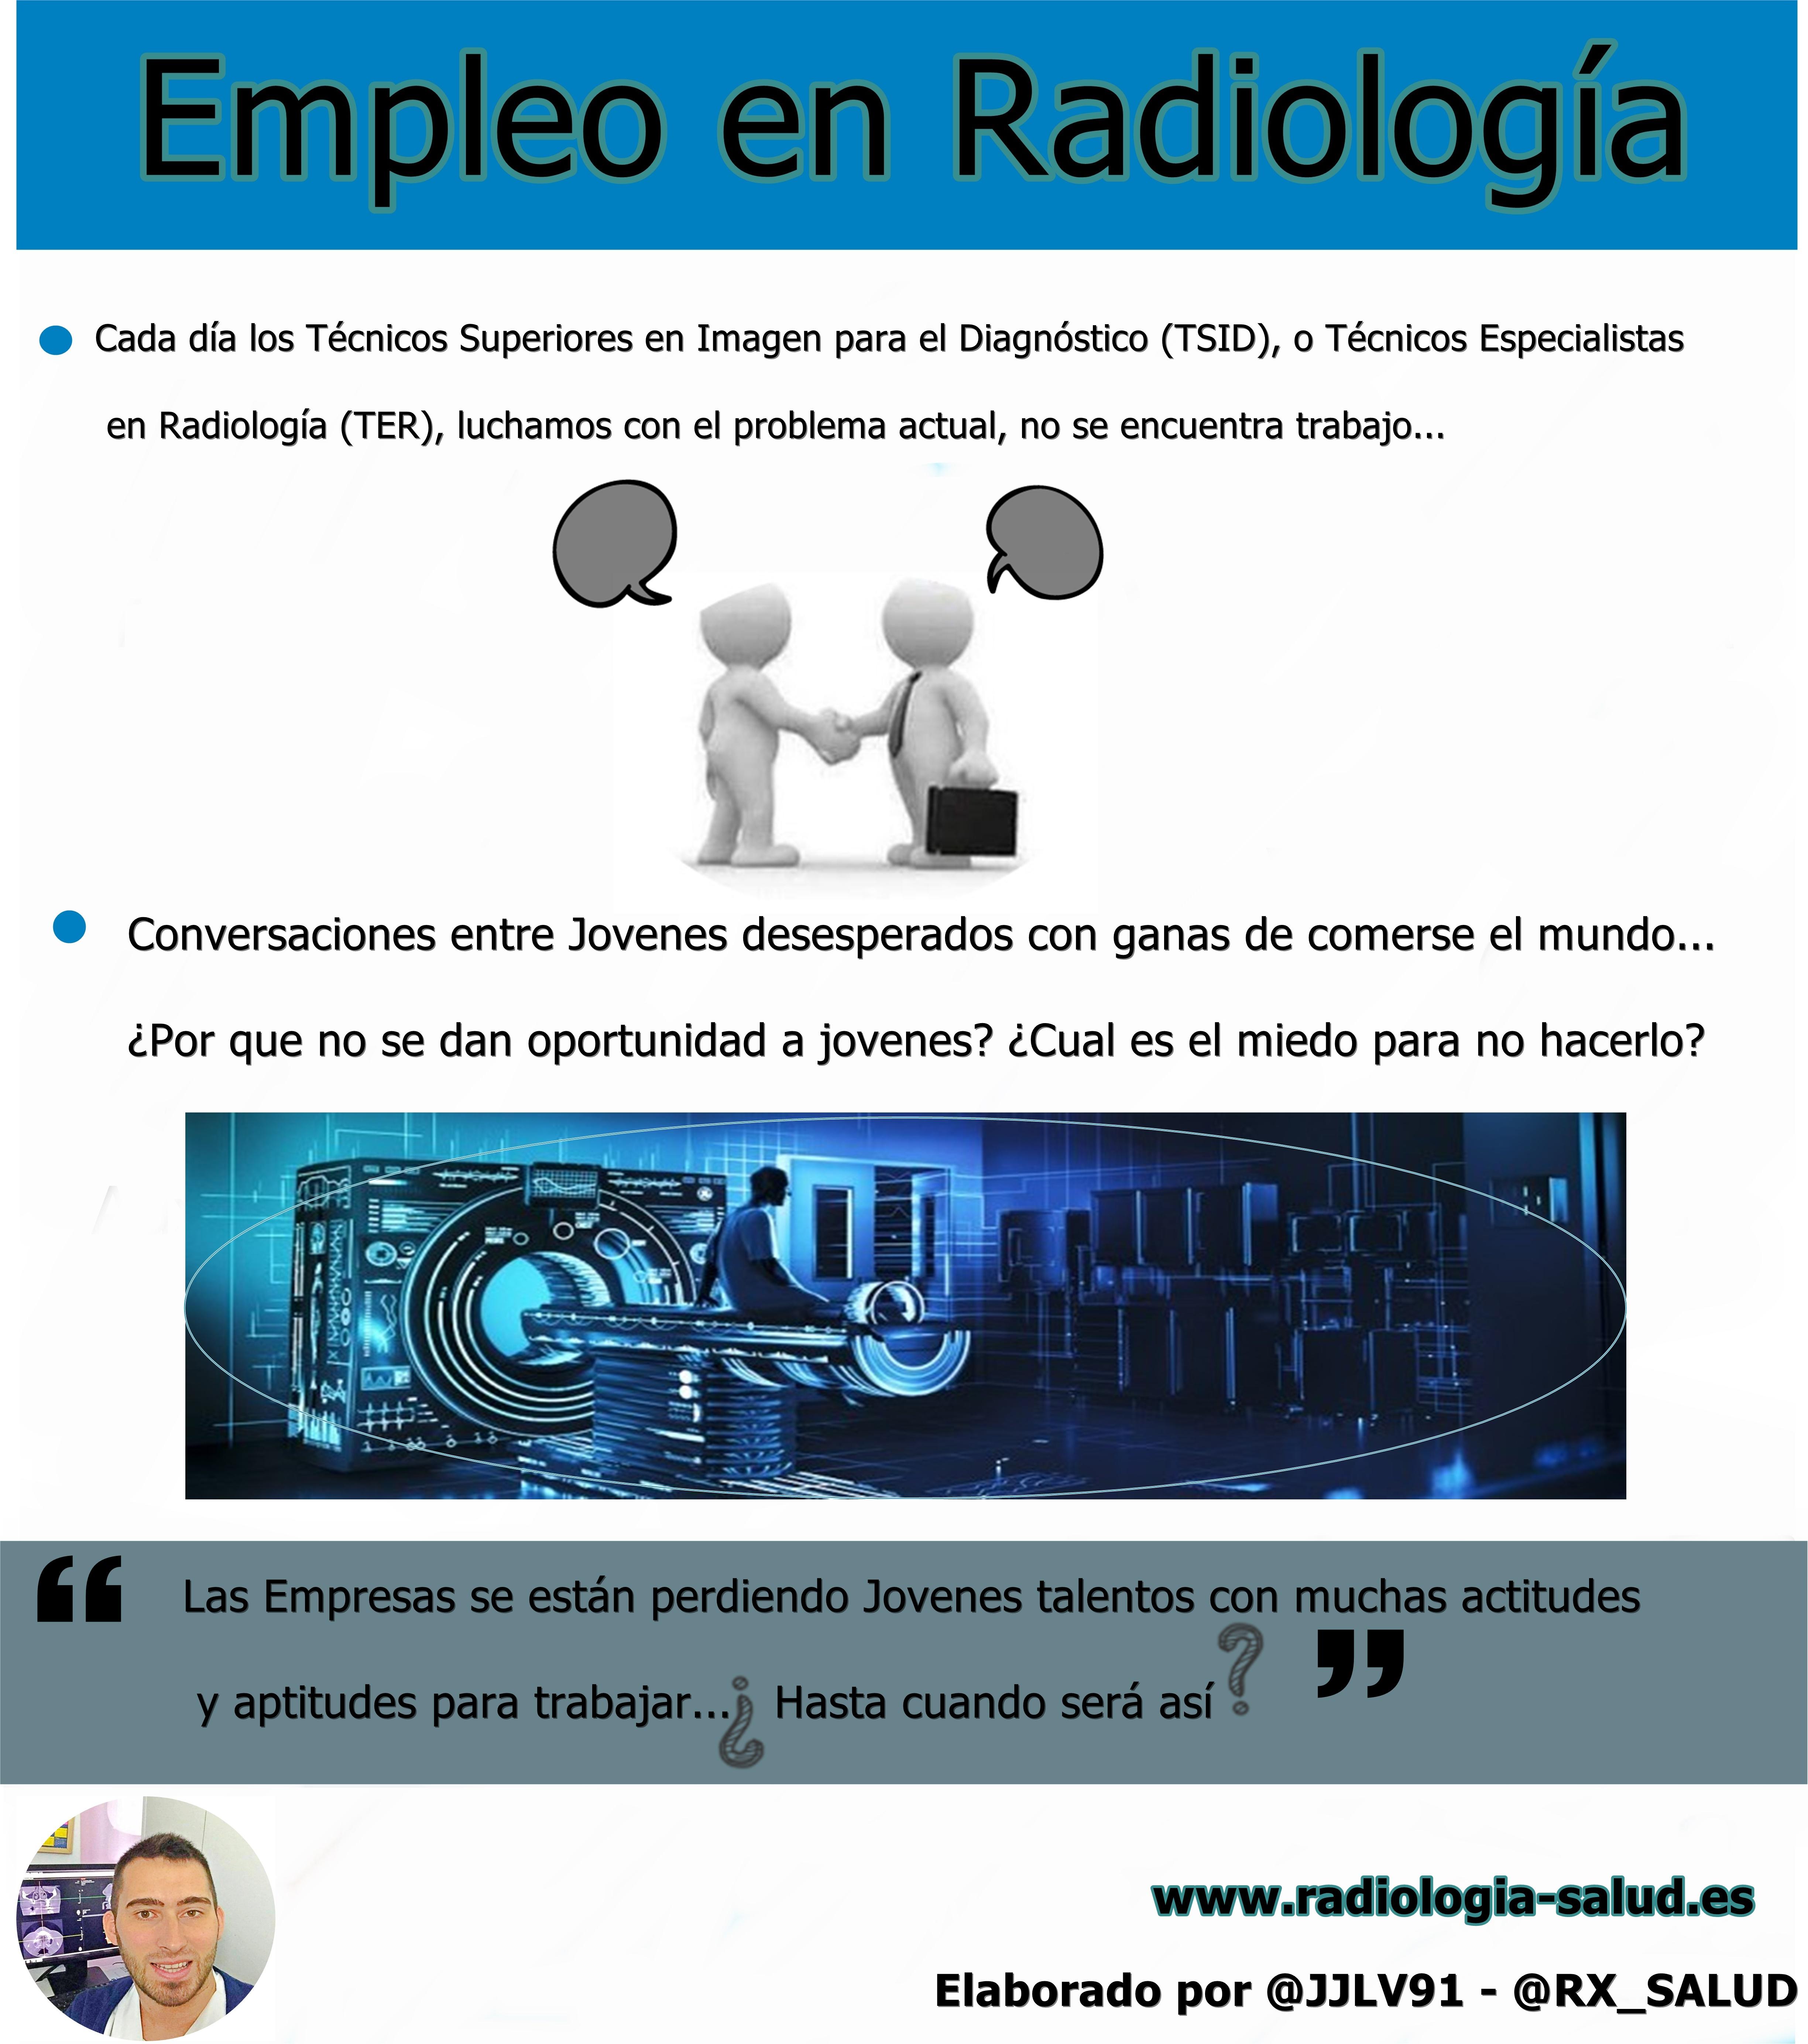 el-empleo-en-radiologia